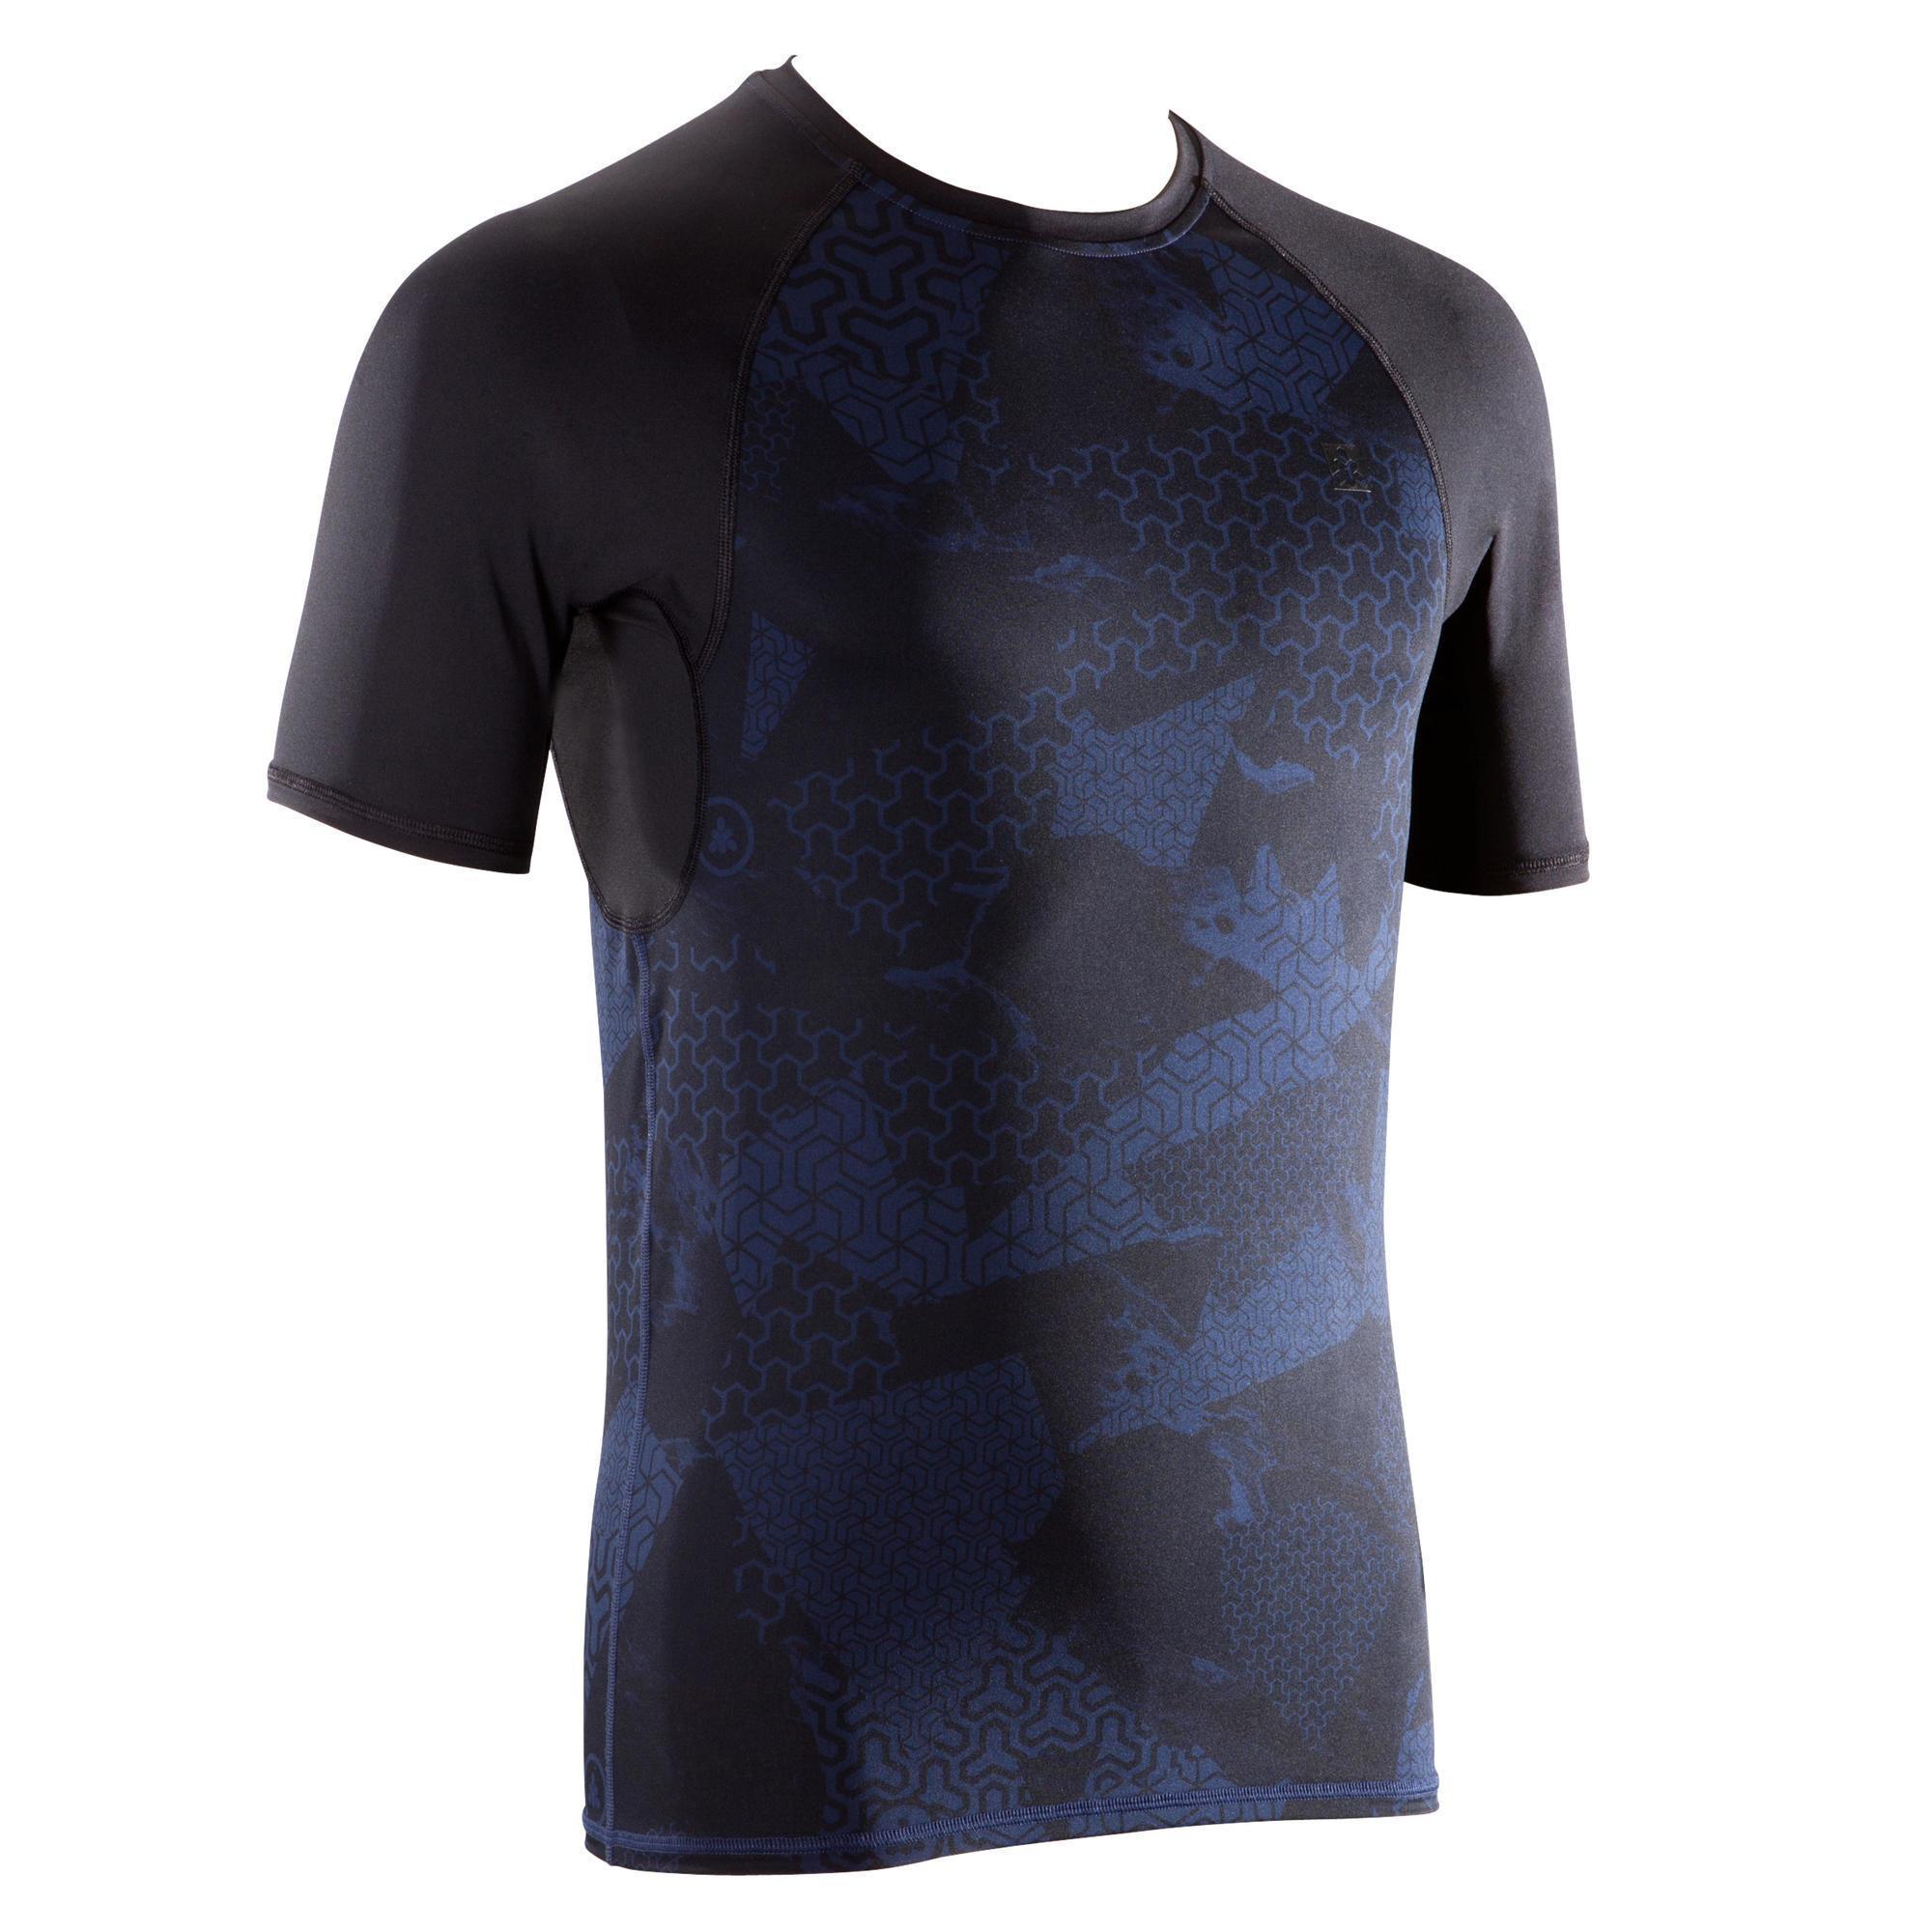 T-Shirt 500 Kompression Crosstraining Herren schwarz/blau | Sportbekleidung > Sportshirts > Poloshirts | Domyos